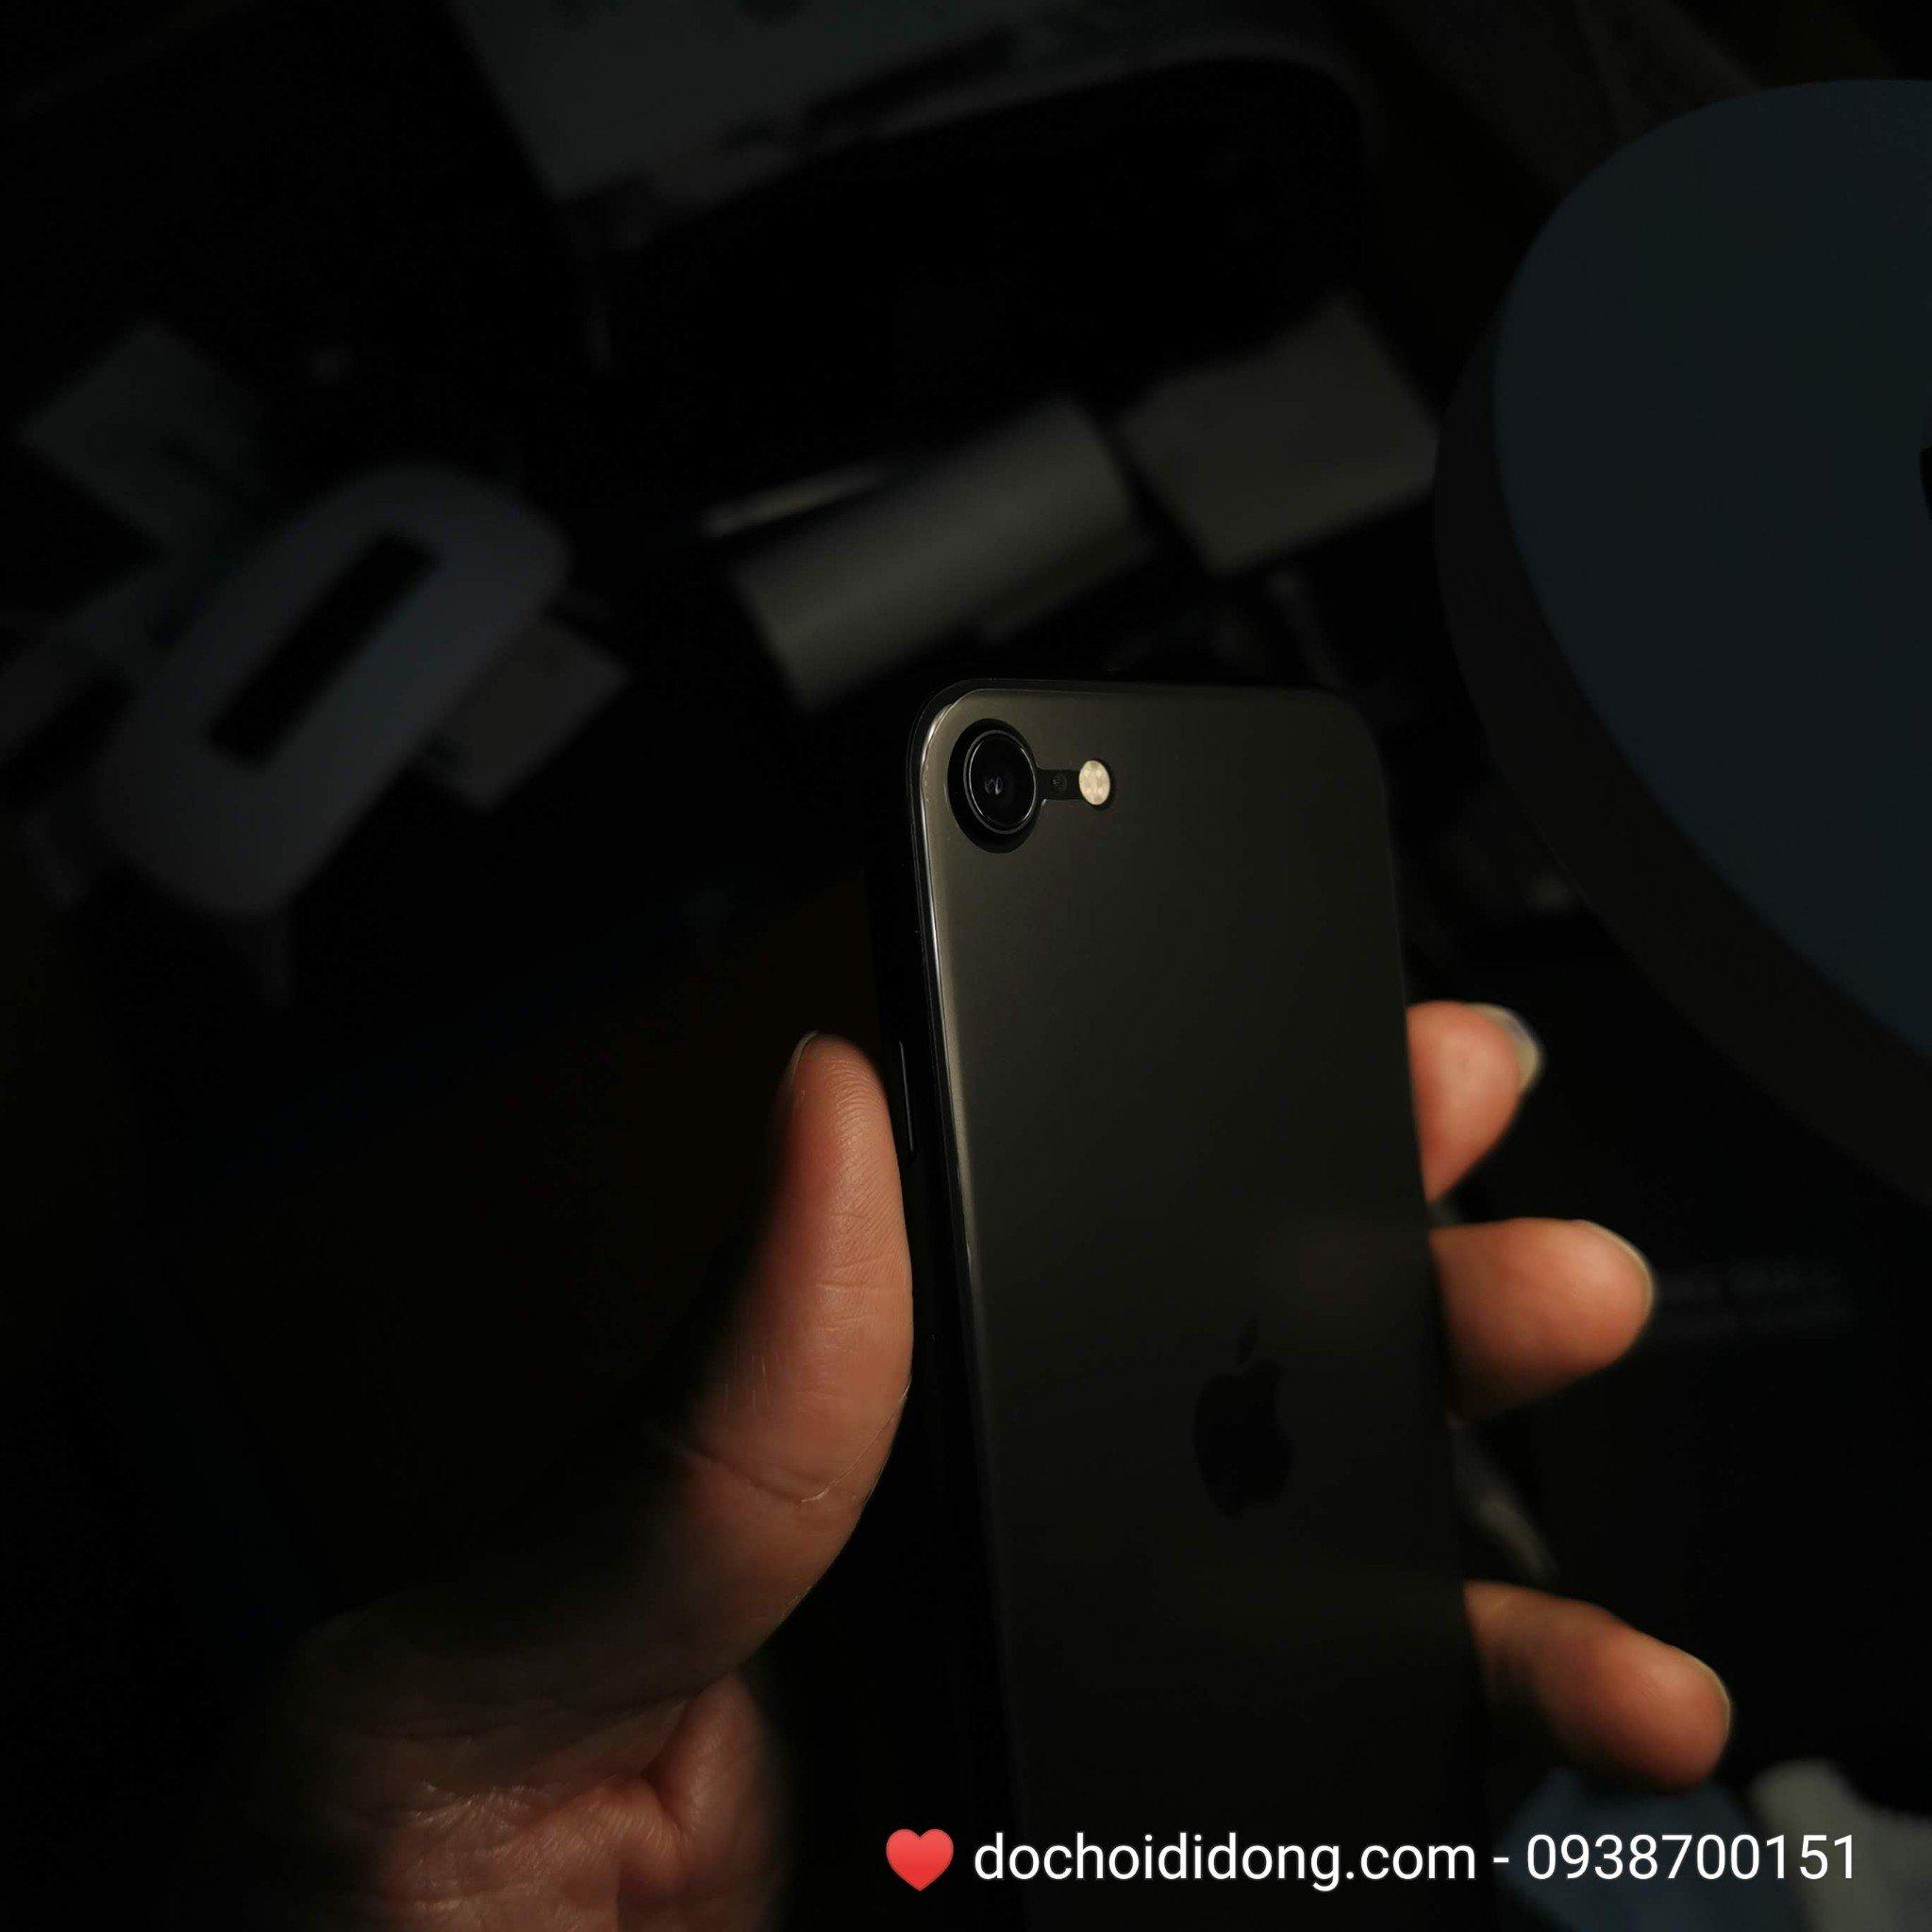 mieng-dan-ppf-rock-iphone-se-2020-trong-nham-doi-mau-cao-cap